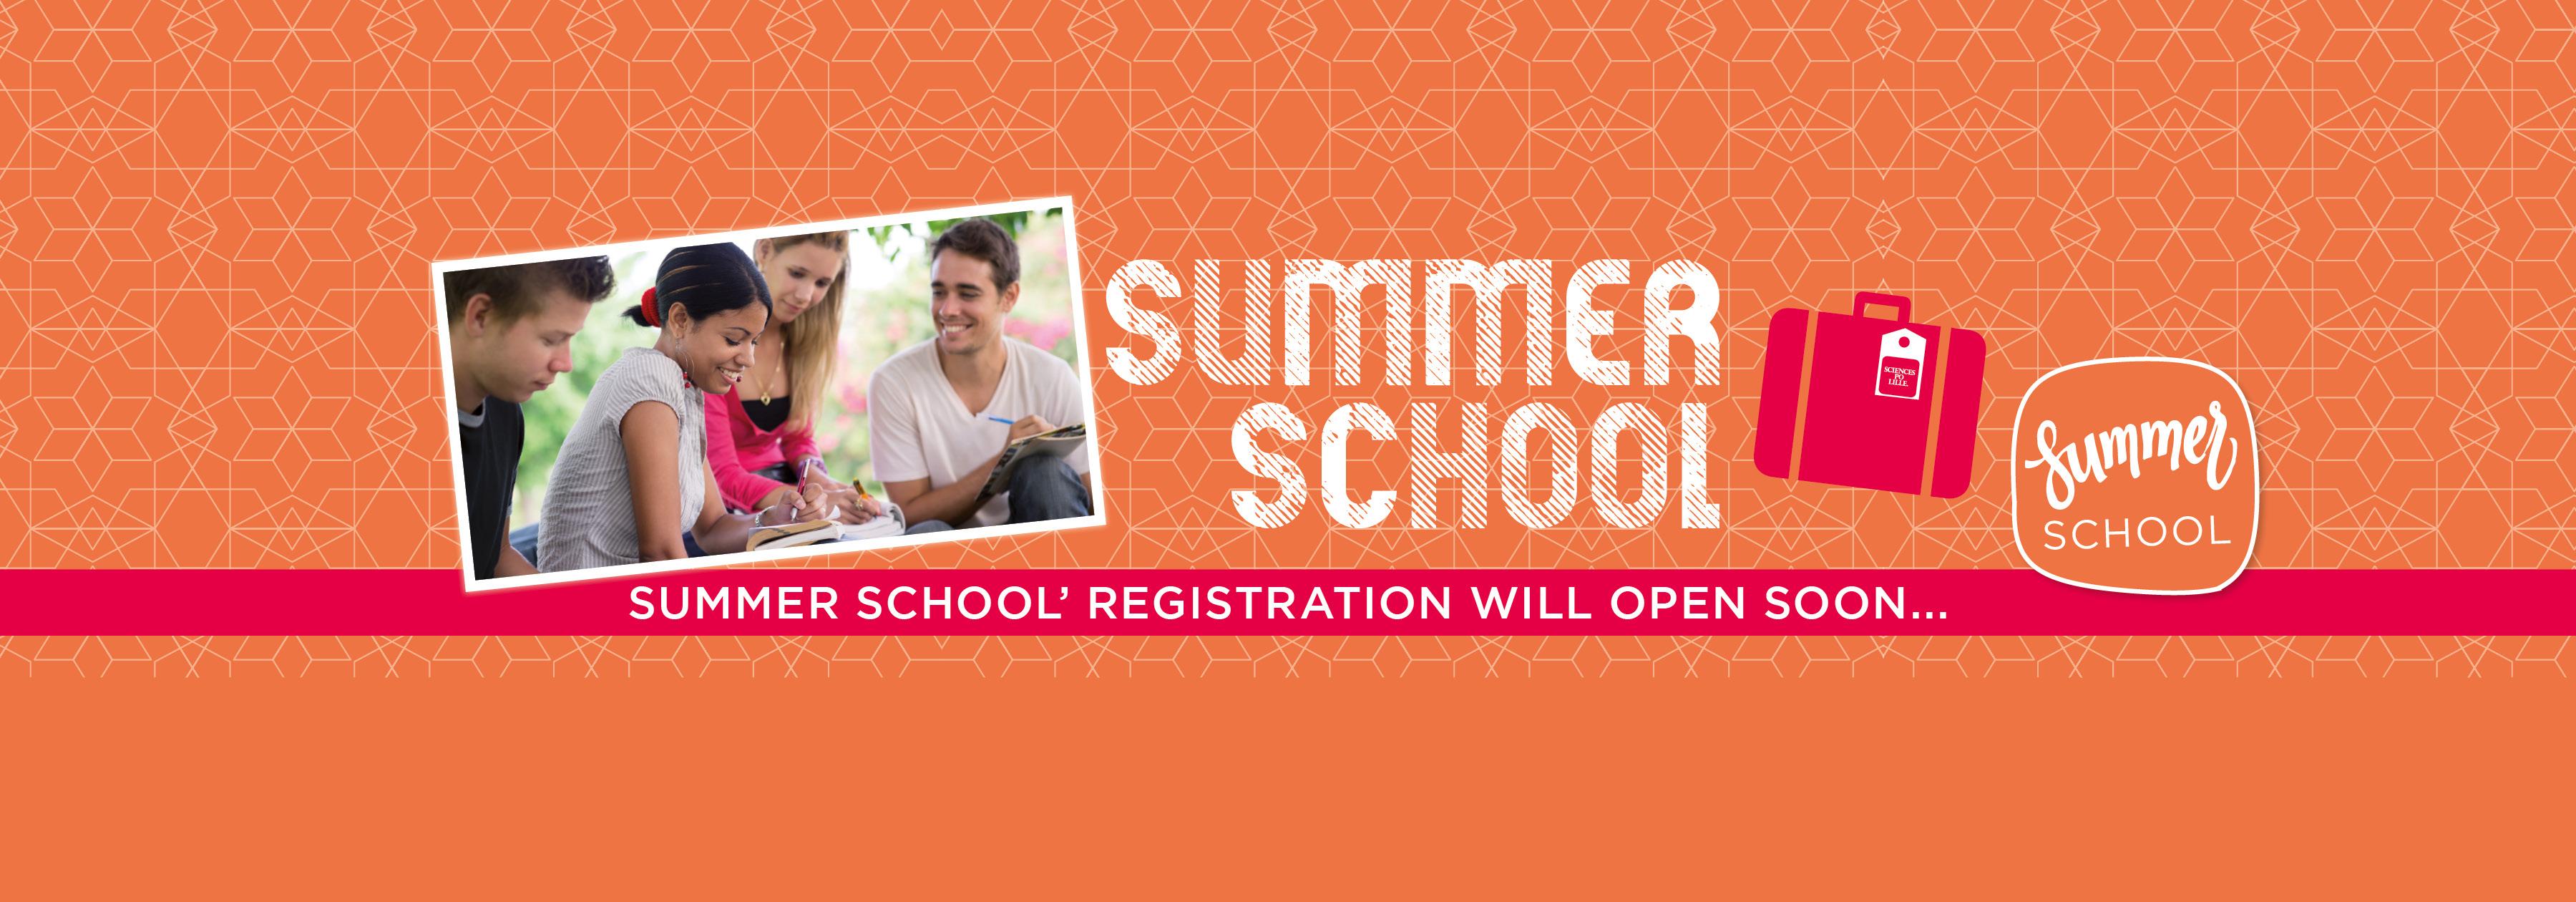 summer school registration will open soon!